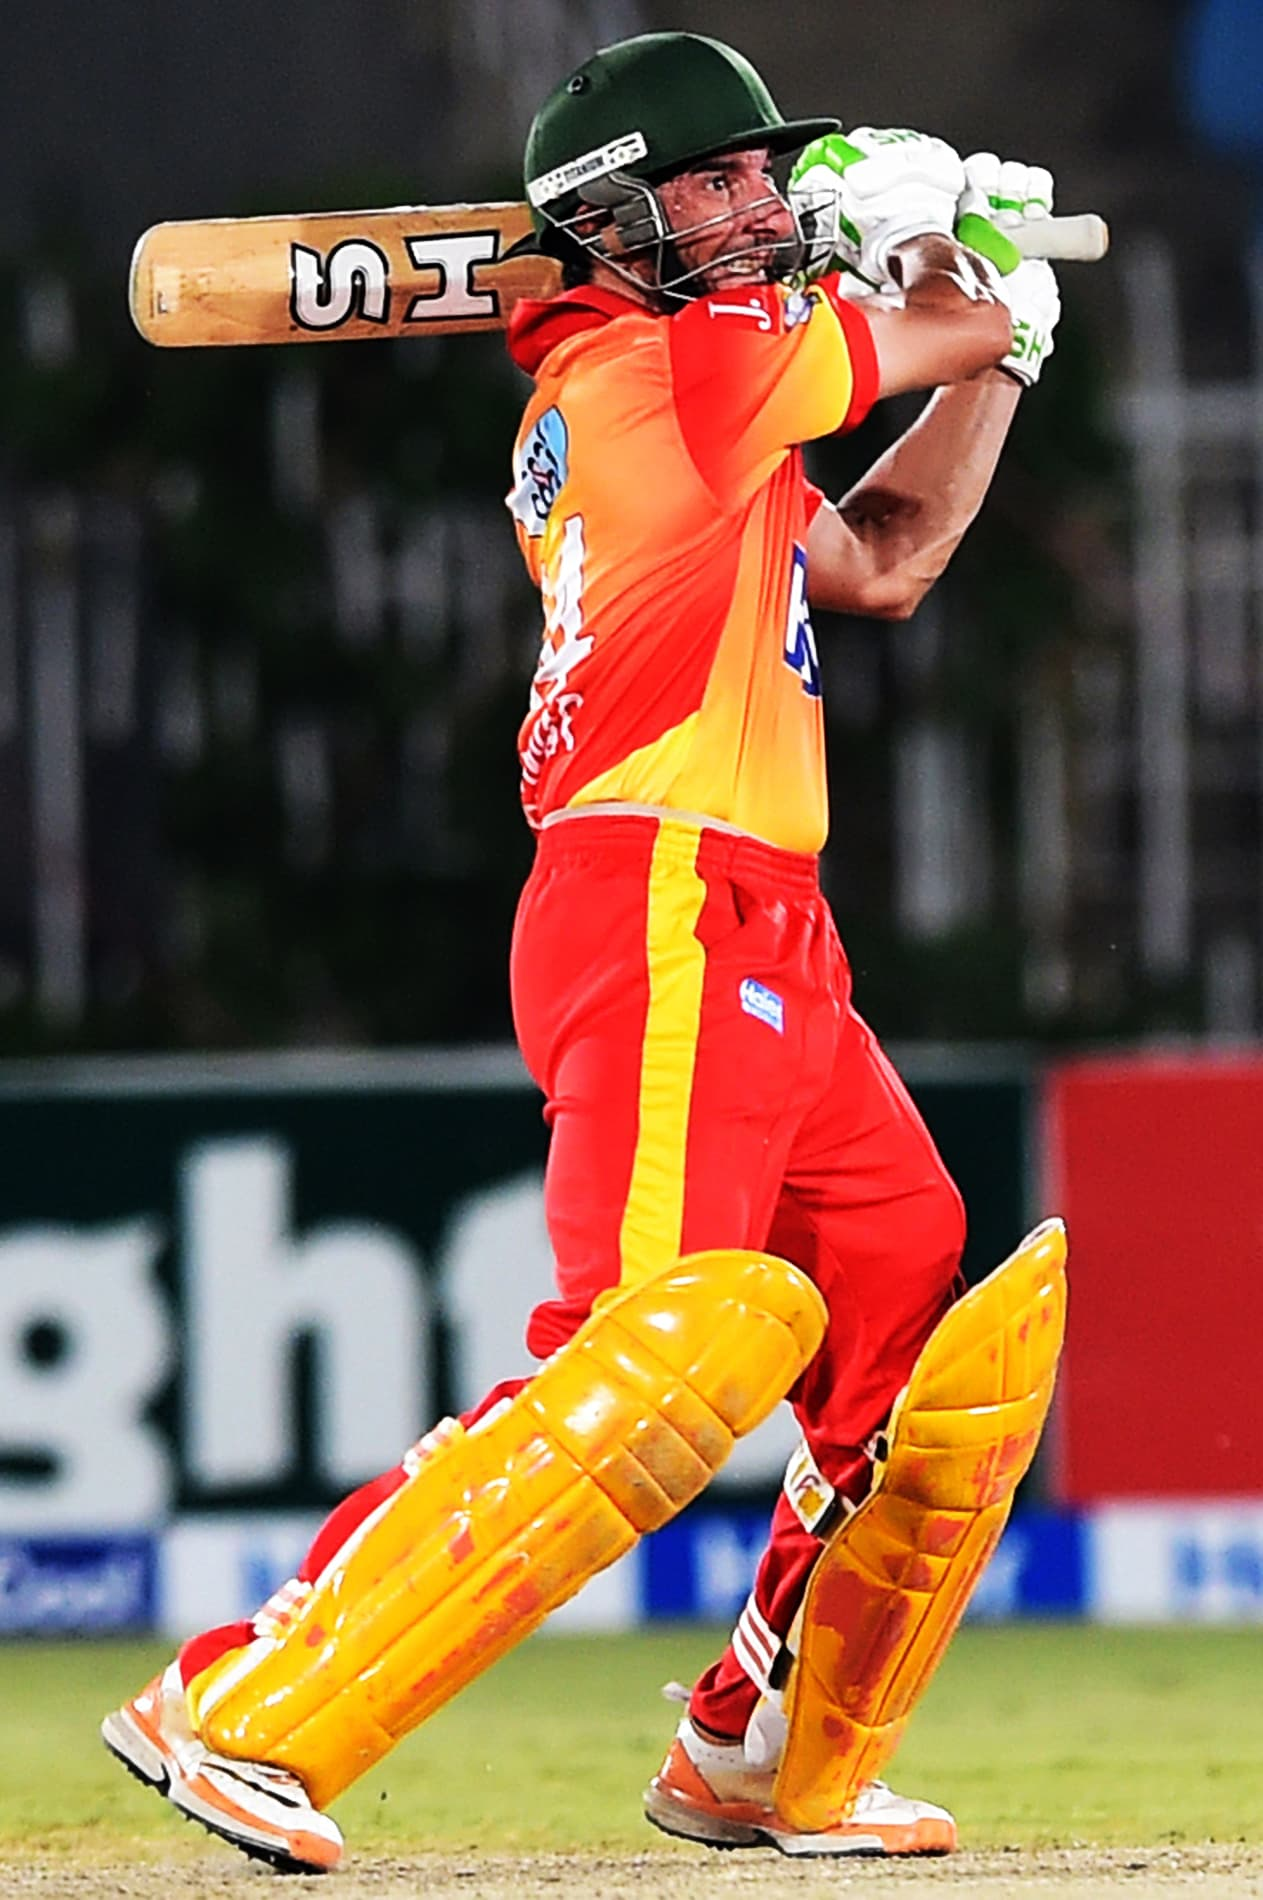 This photo taken on September 14, 2015 shows Peshawar cricket team opener Raffatullah Mohmand batting against Sialkot during the National T20 semi-final at the Rawalpindi Cricket Stadium in Rawalpindi. — AFP